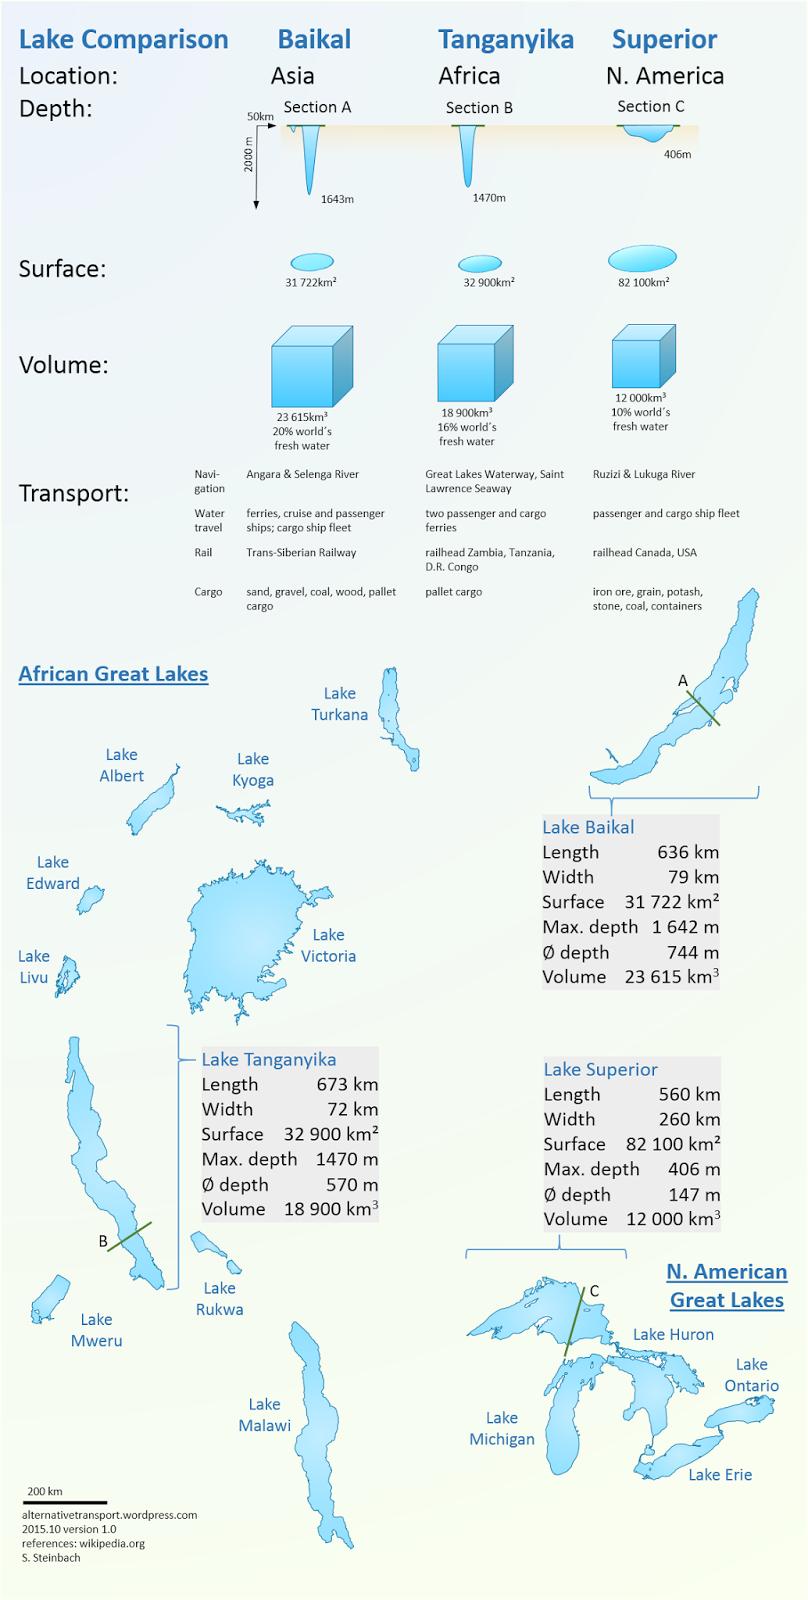 Lake Comparison Baikal, Tanganyika and Superior